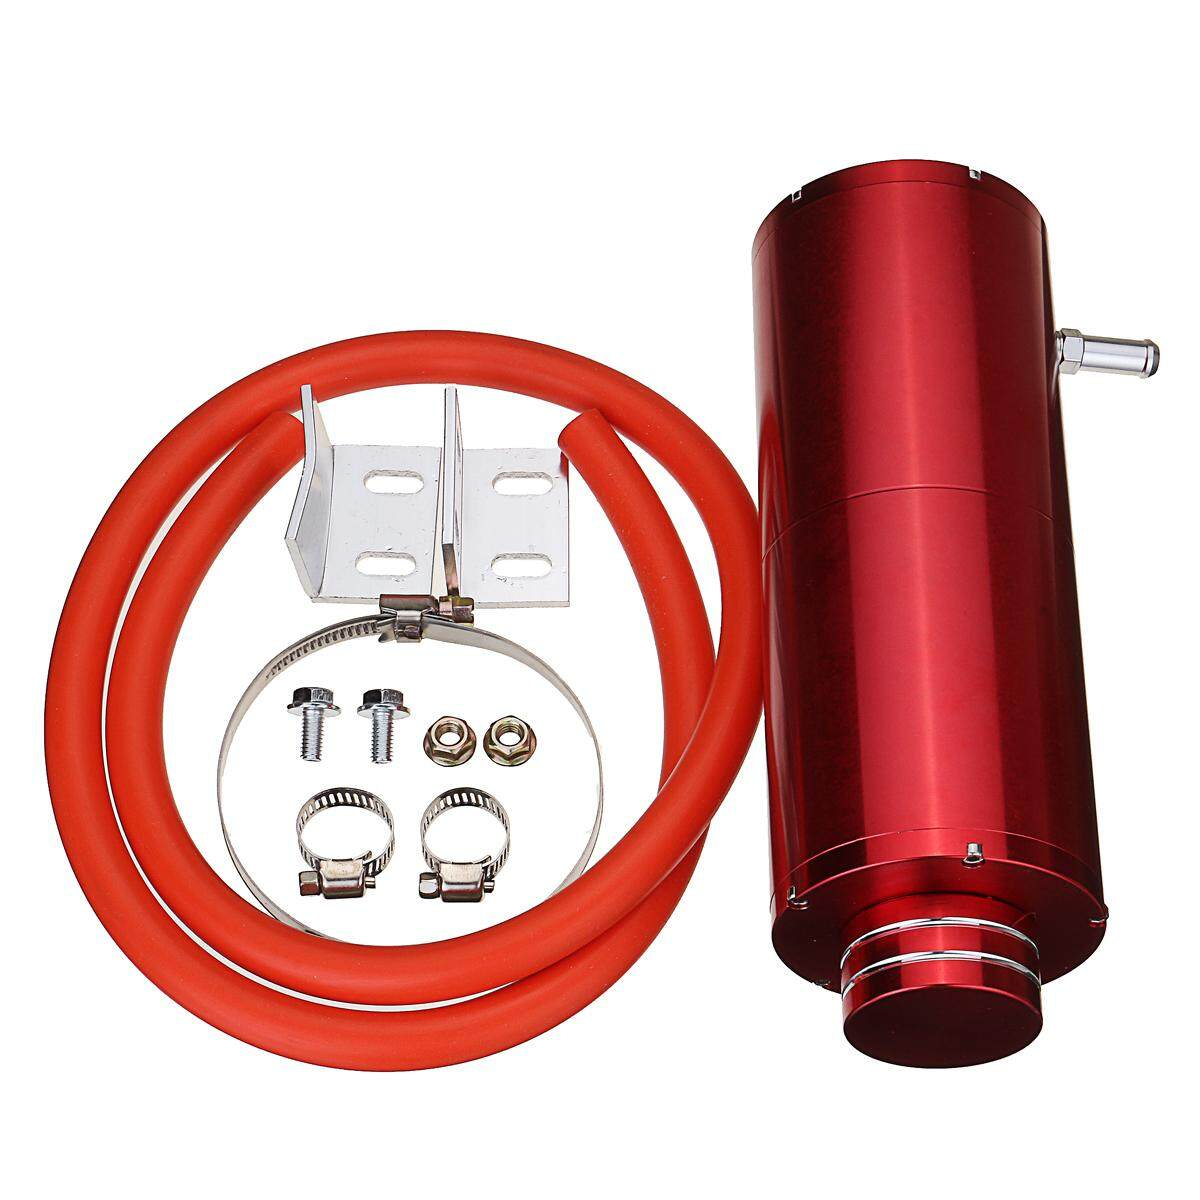 Red Cylinder Radiator Reservoir Tank Coolant Overflow Hose Can Reserve O Il Intl